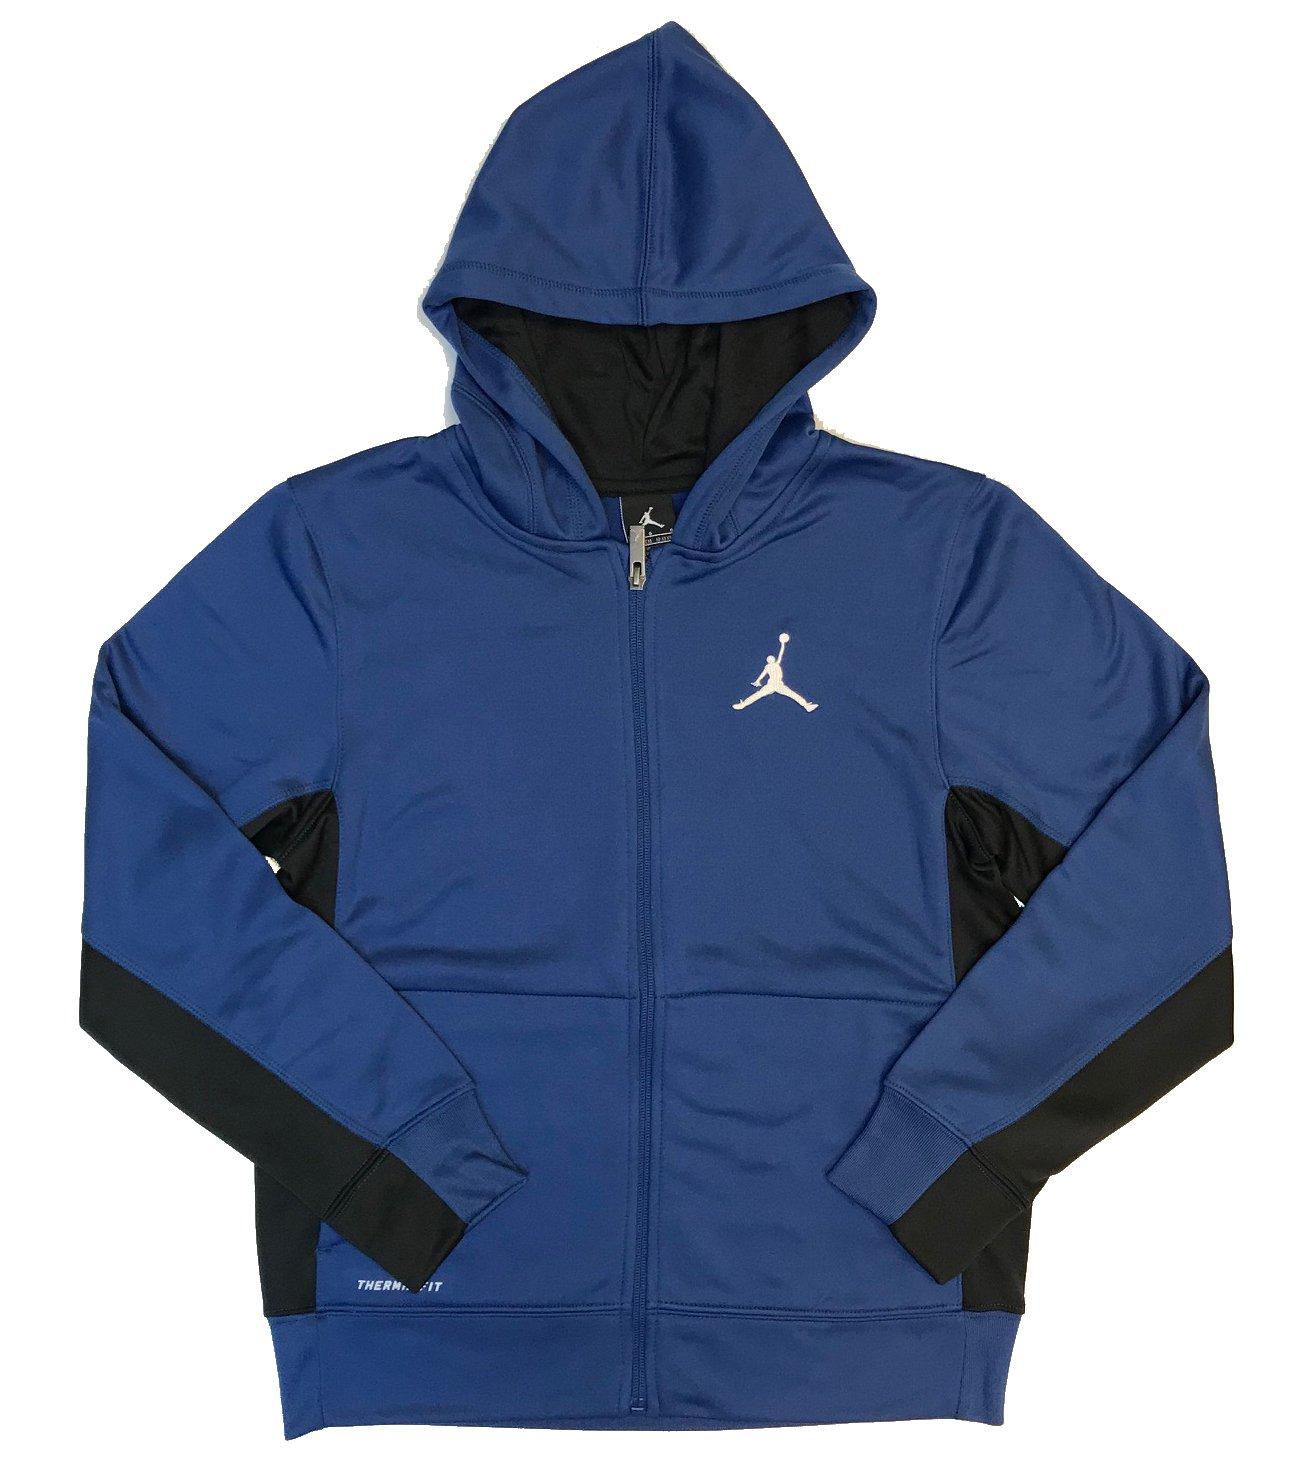 NIKE Air Jordan Boys' Therma-Fit Jumpman Full Zip Hoodie (Blue/Black, Large)